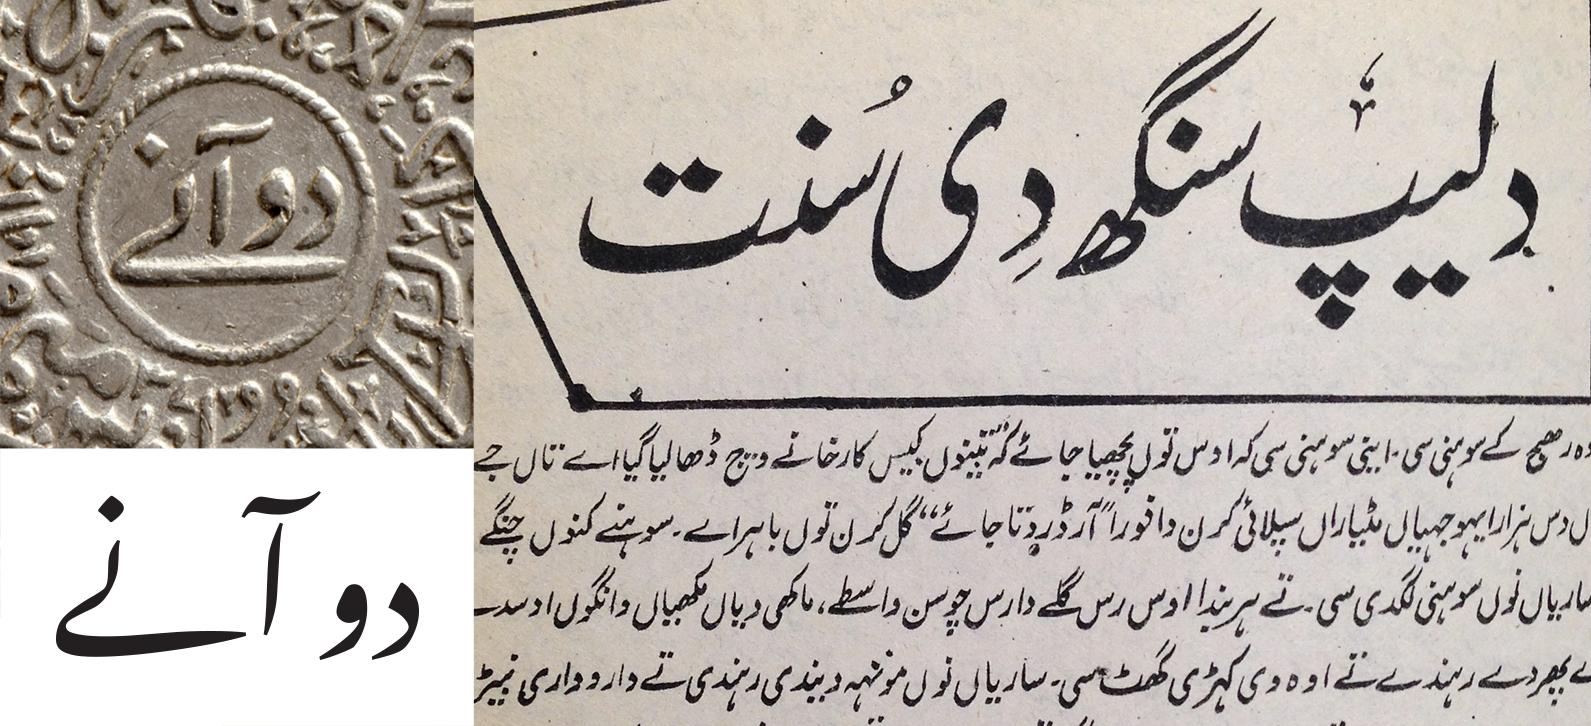 Note Nastaliq Letters Generally